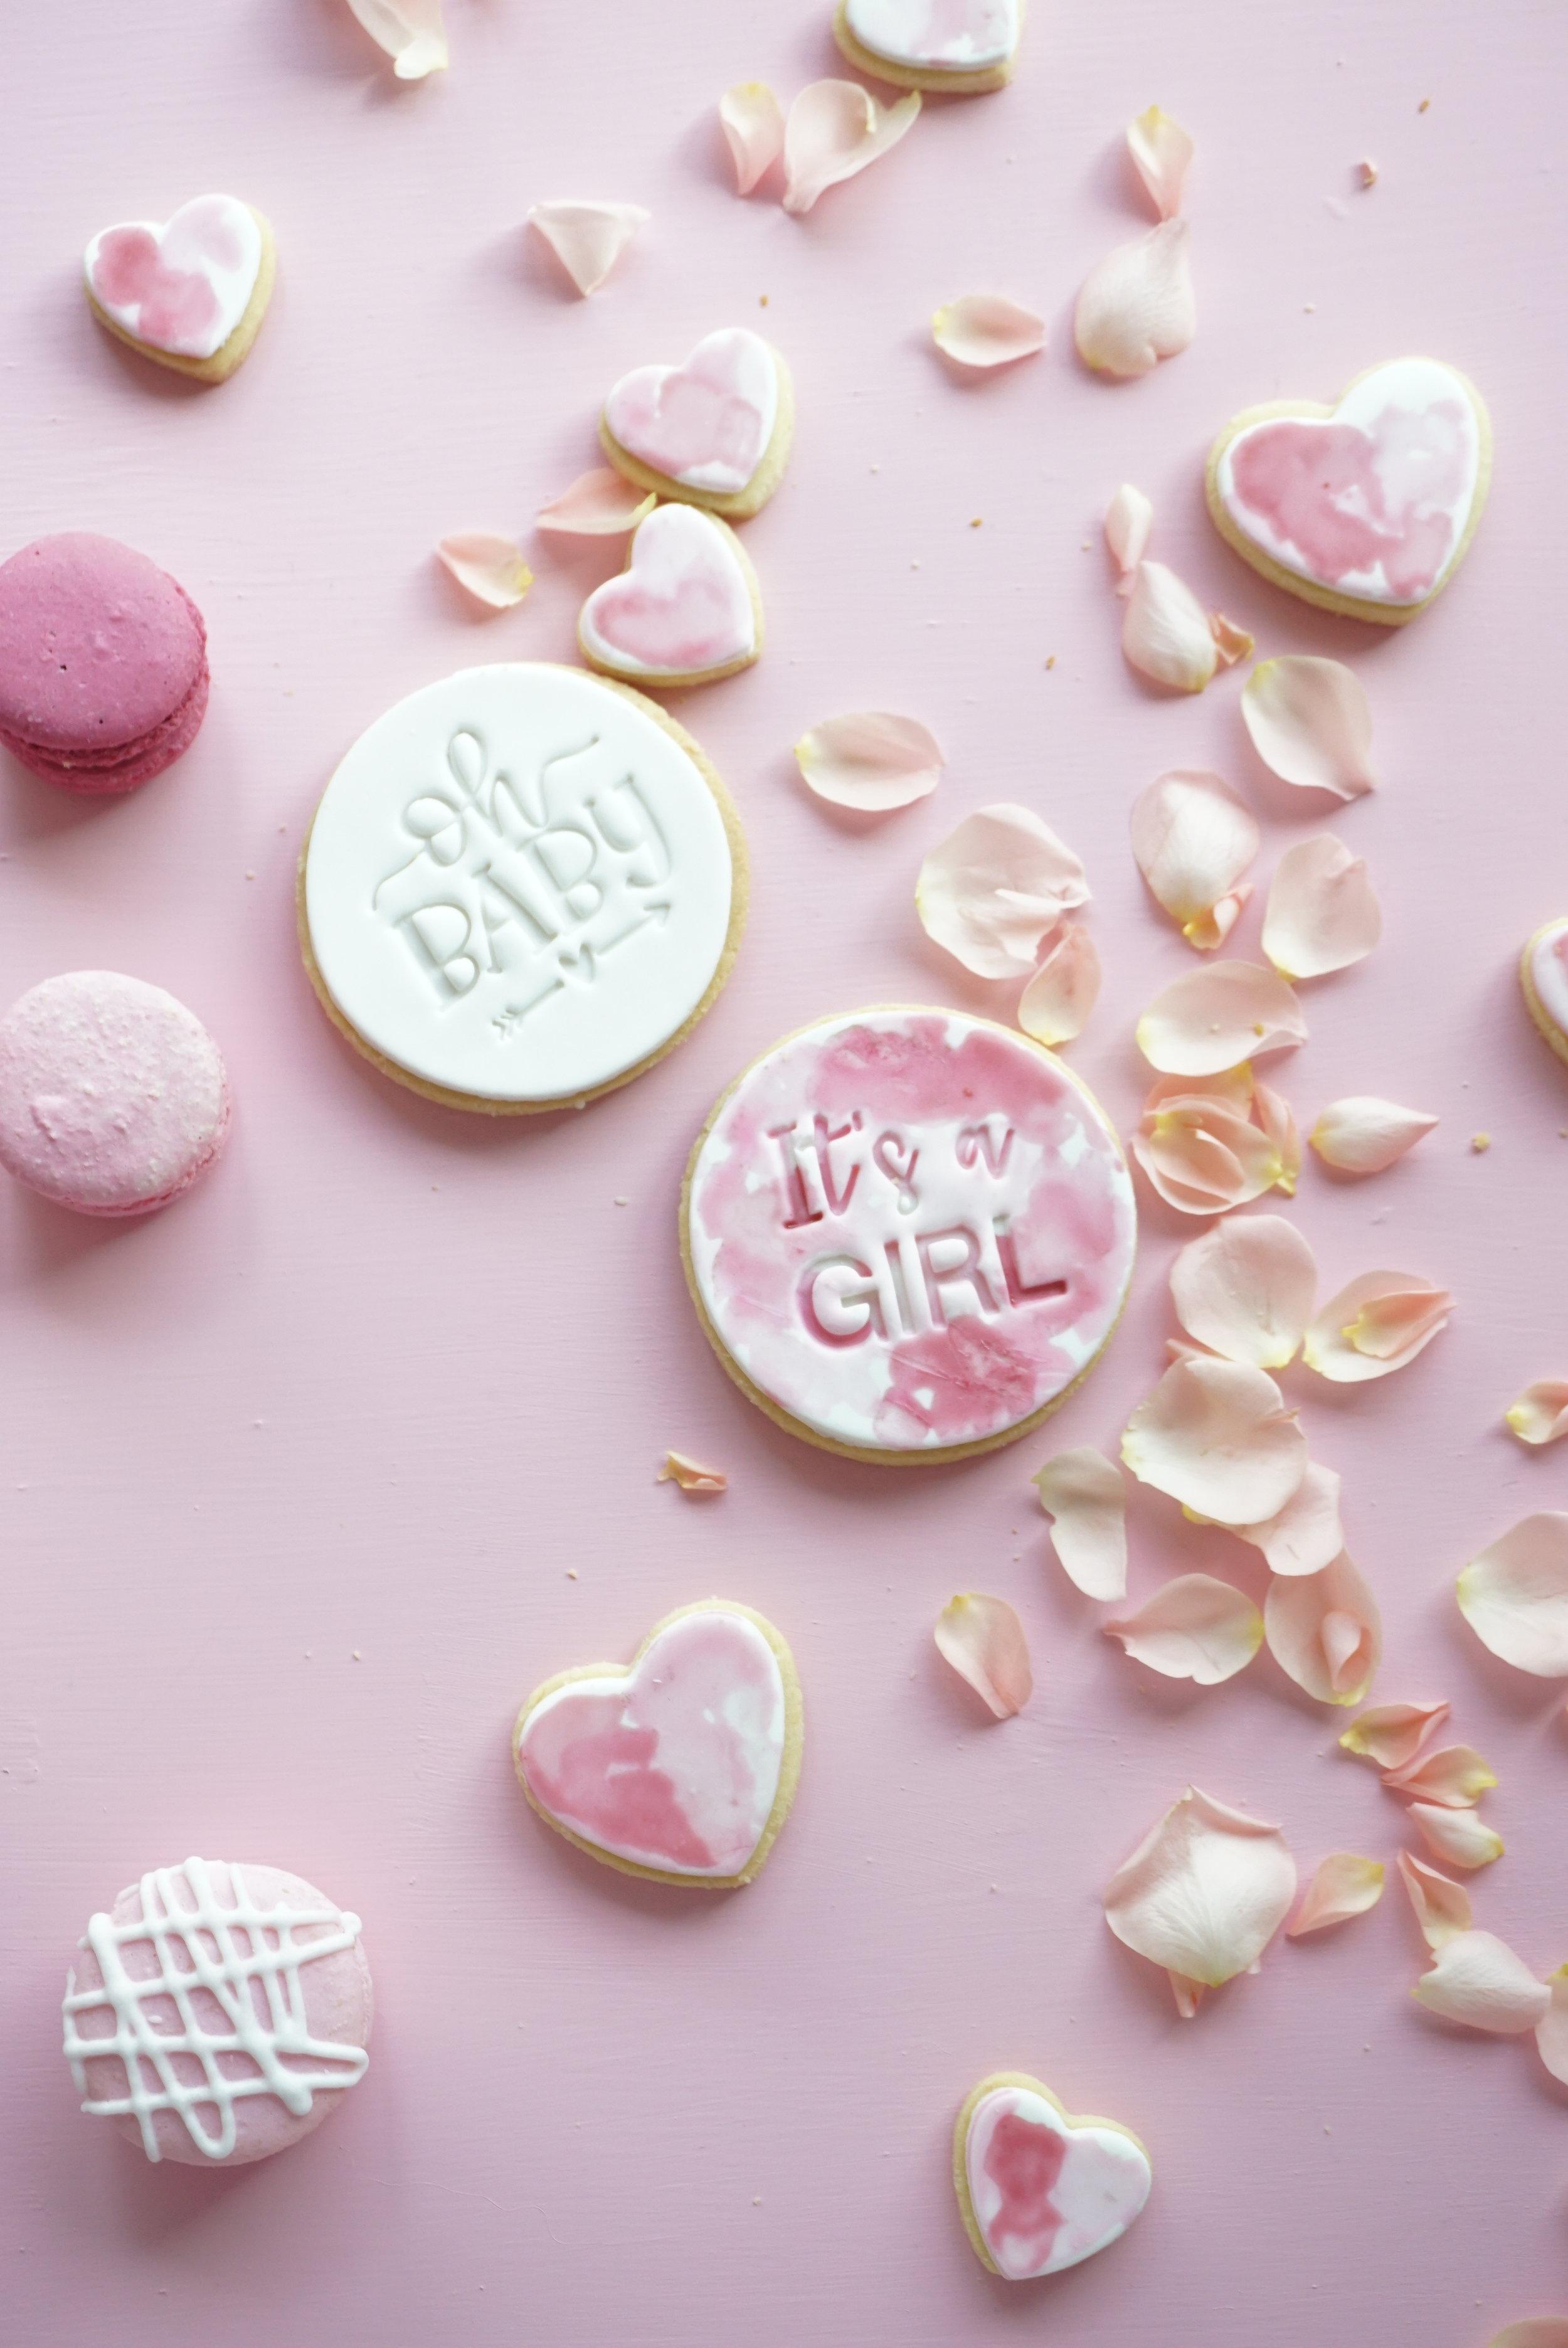 Cakes_By_Aranee_Perth_Drip_Cakes_Custom_Cakes_Wedding_Cakes_Macarons_Cupcakes_Personalised_Cookies_OTHER_DESSERTS_Gallery6.JPG